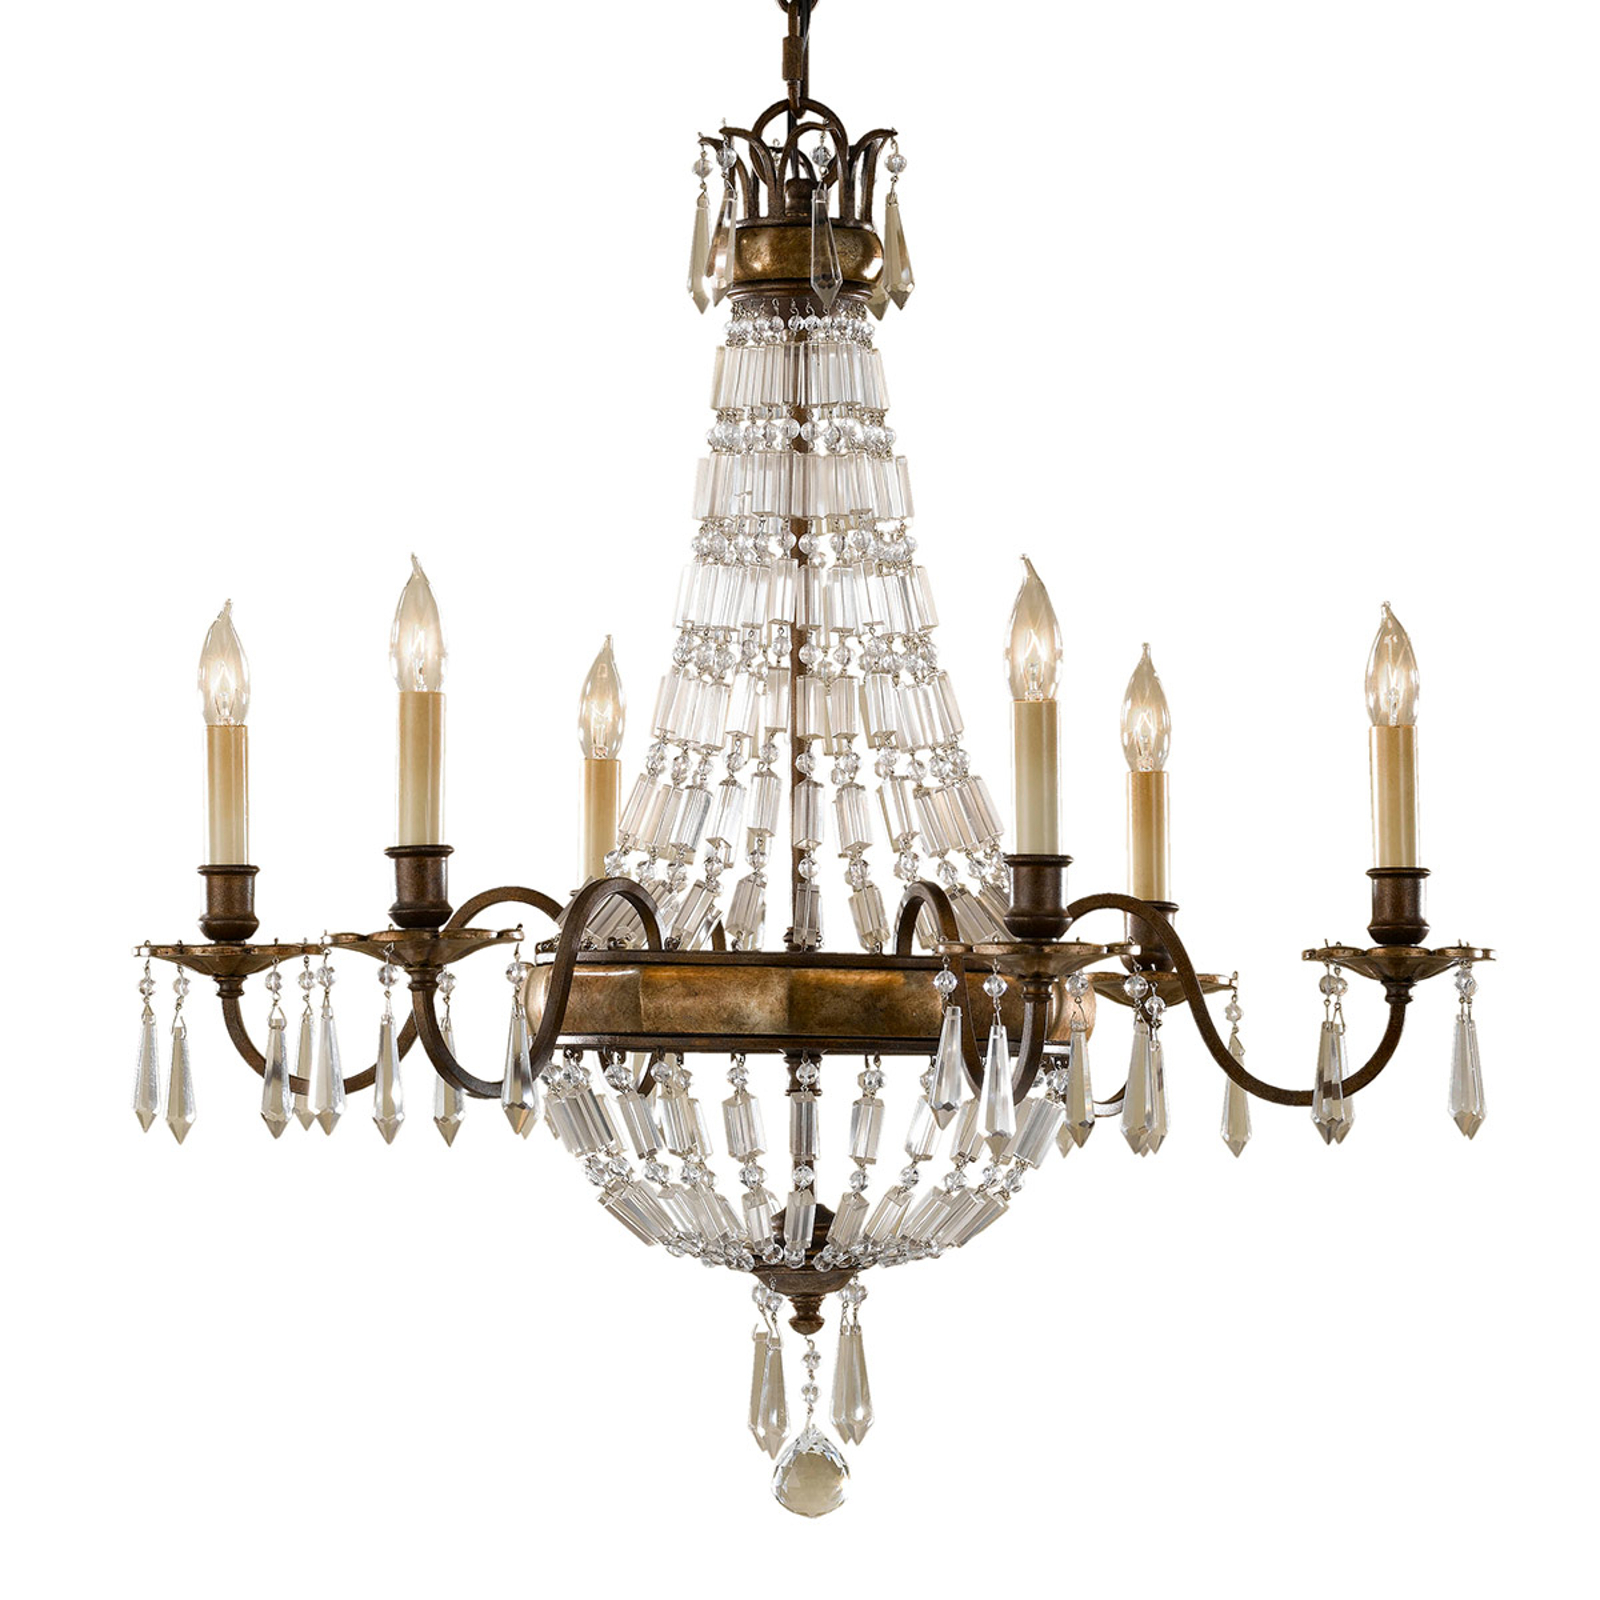 Bellini - lampadario di stile antico